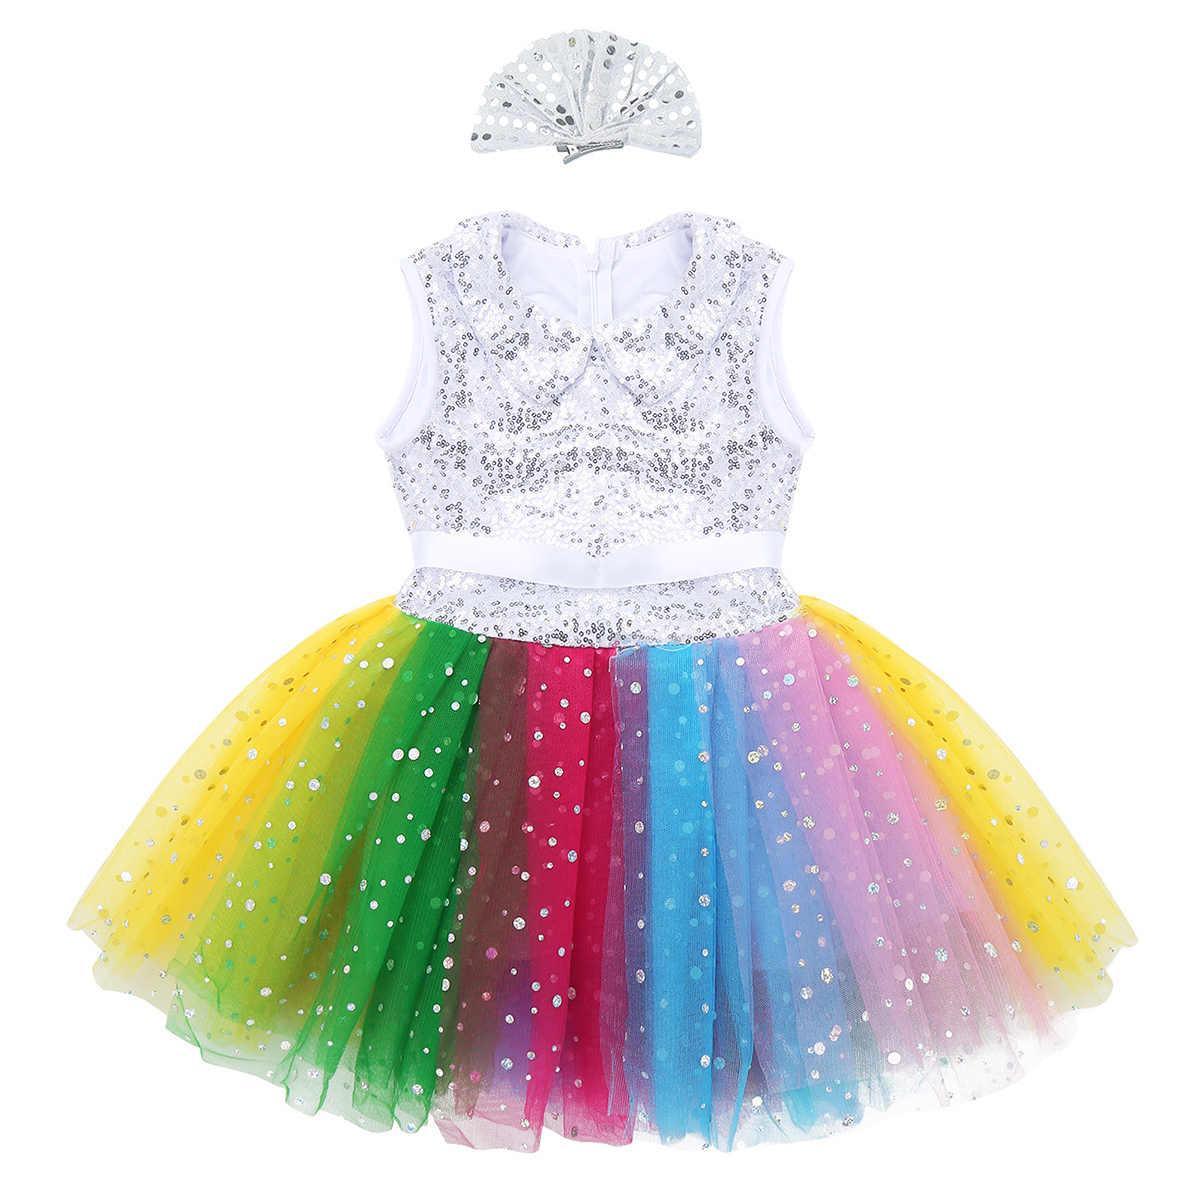 Niños Niñas sin mangas lentejuelas Arco Iris malla Ballet tutú vestido con pinza para el pelo conjunto niños moderno etapa actuación traje de baile